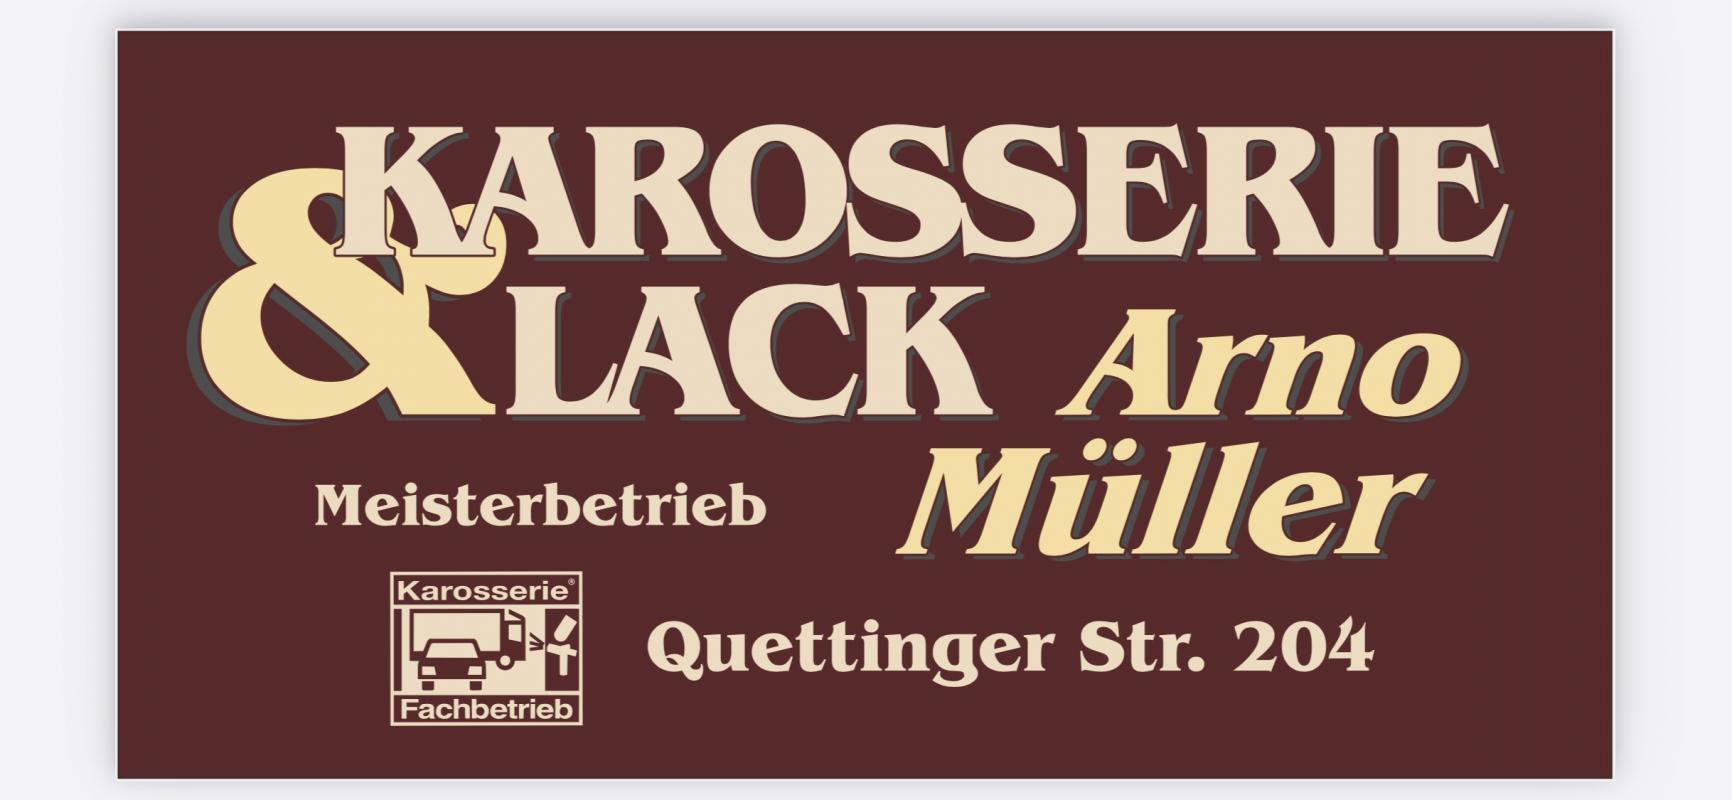 Karosserie & Lack Arno Müller